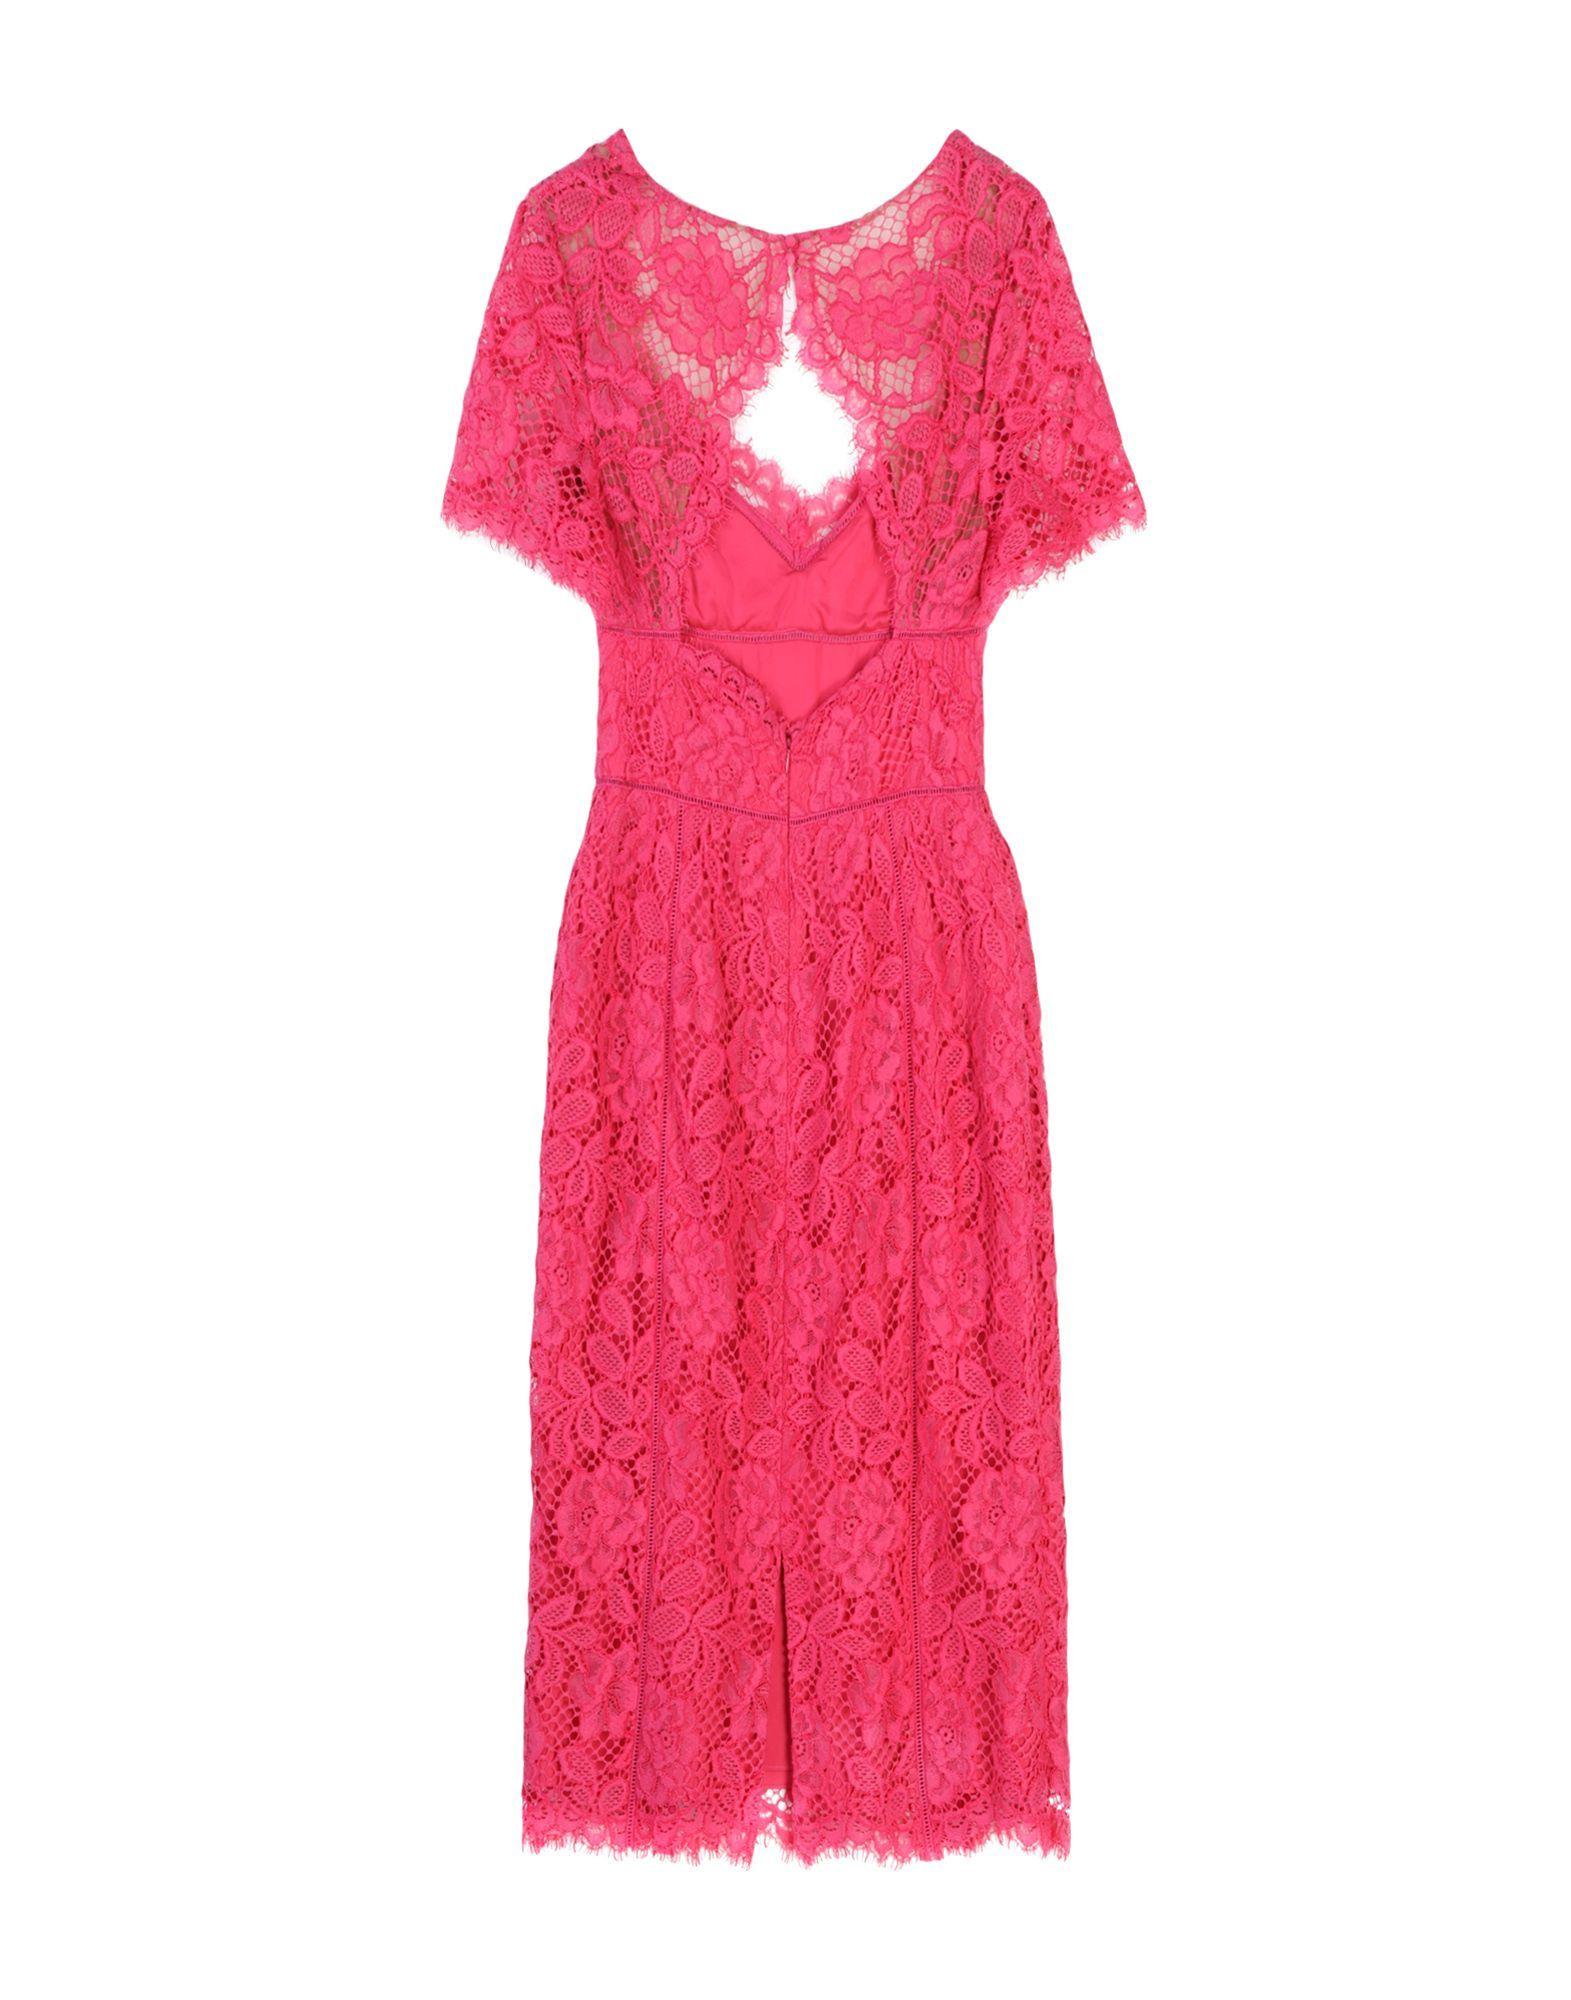 DRESSES Marchesa Notte Fuchsia Woman Cotton